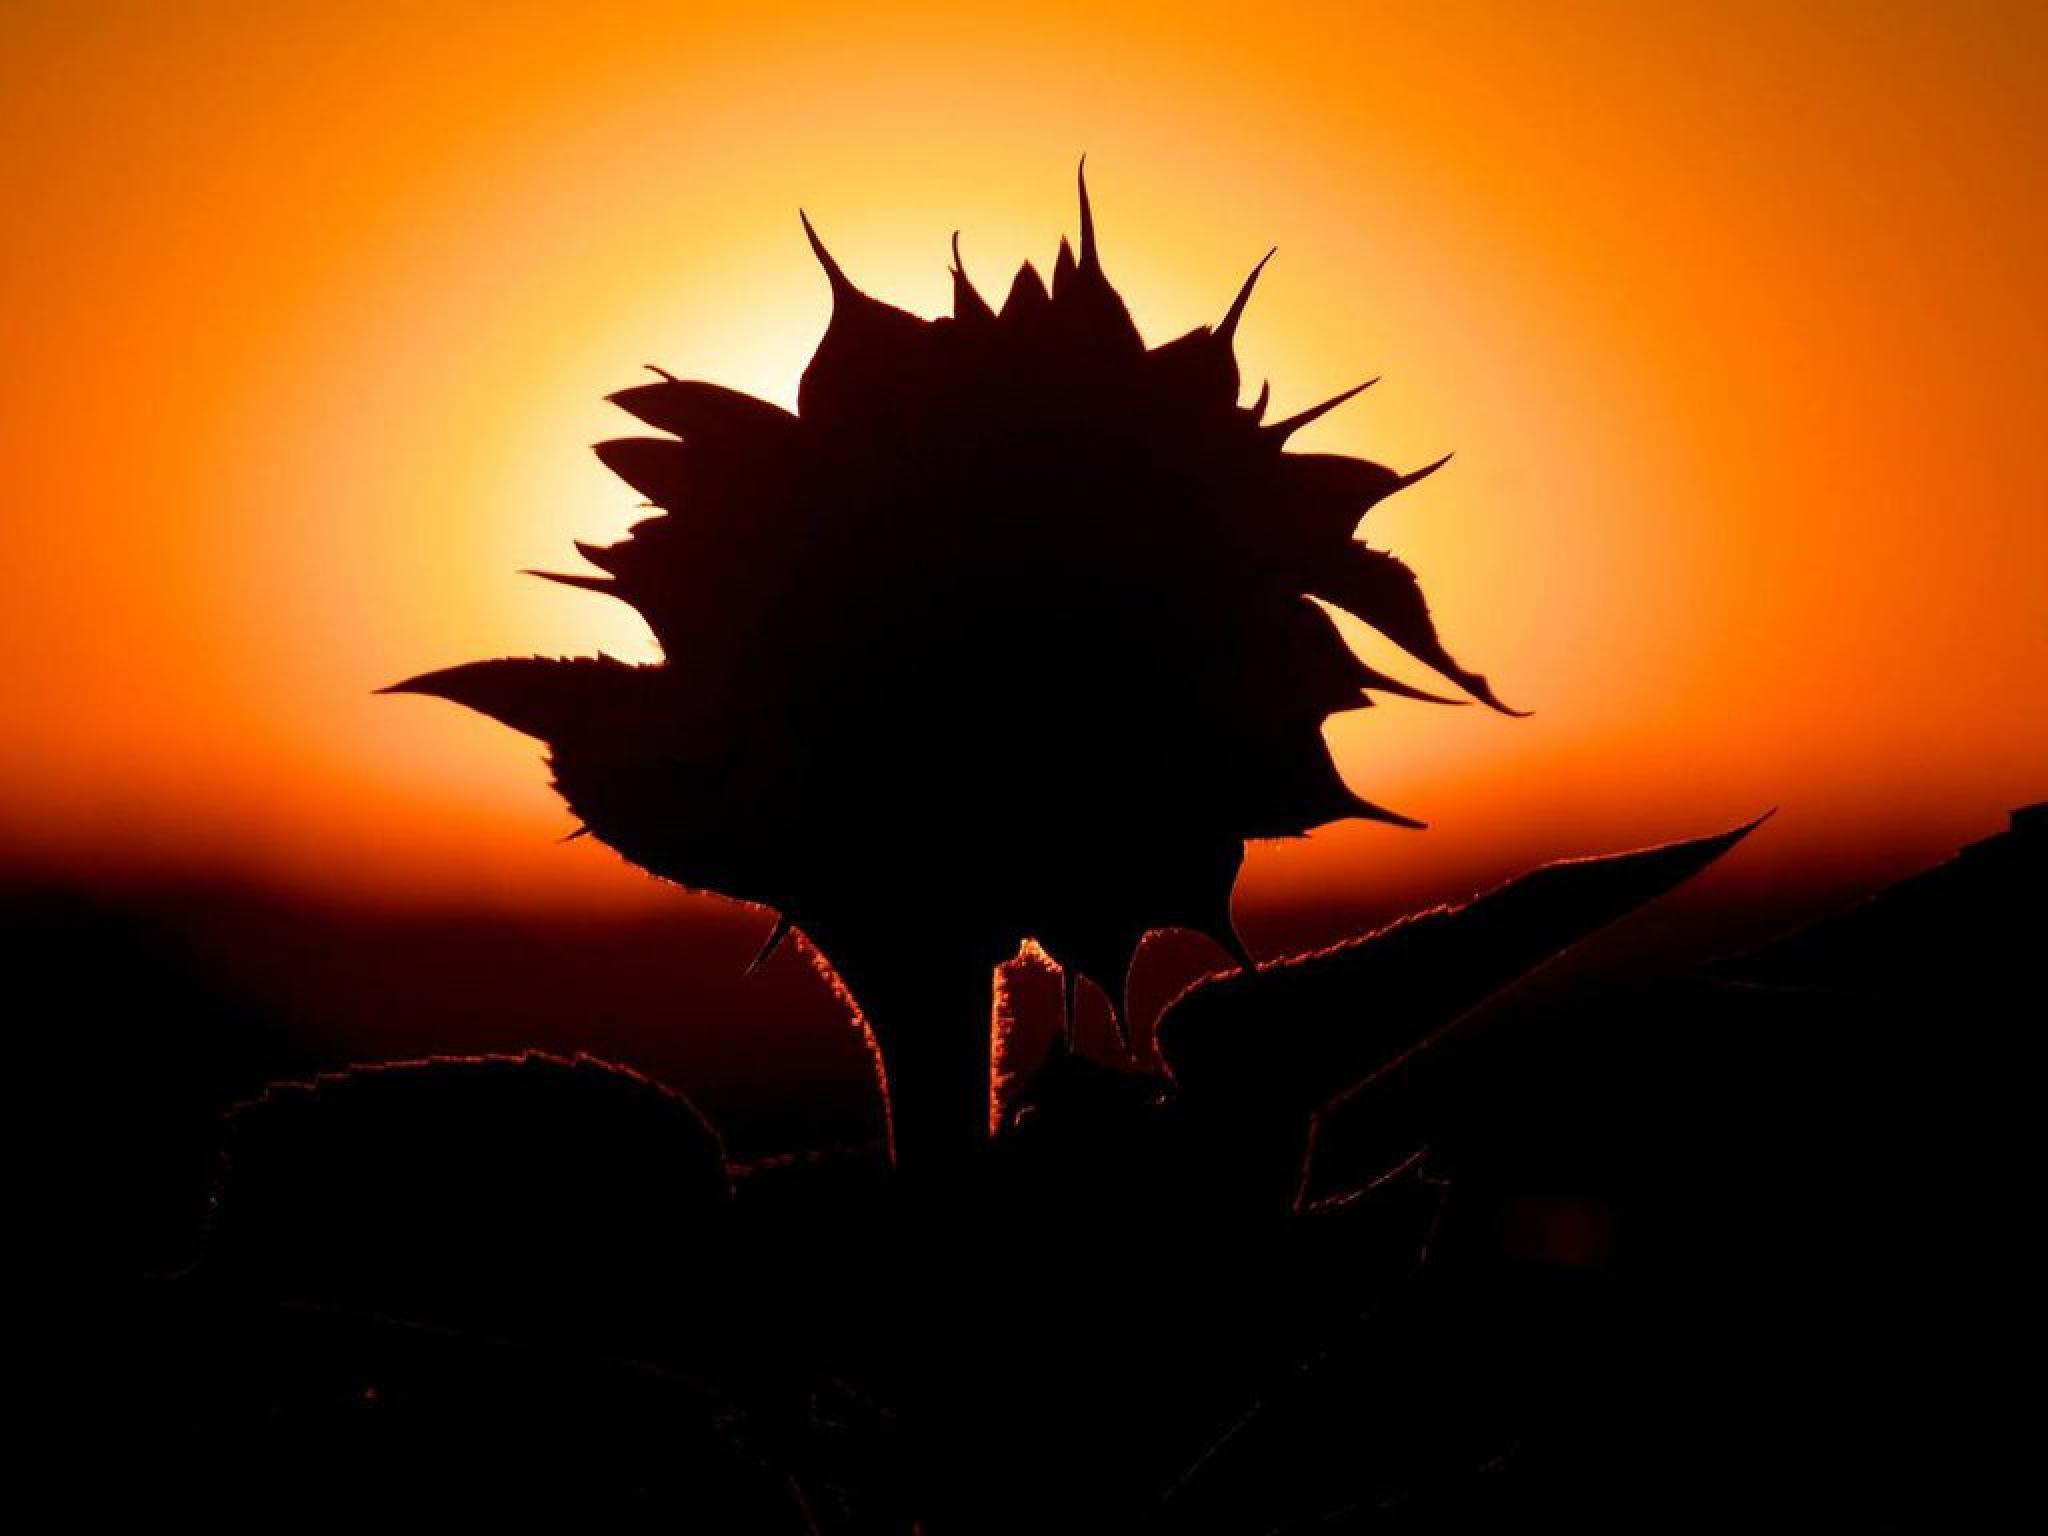 Sunflower by Kenéz Imre